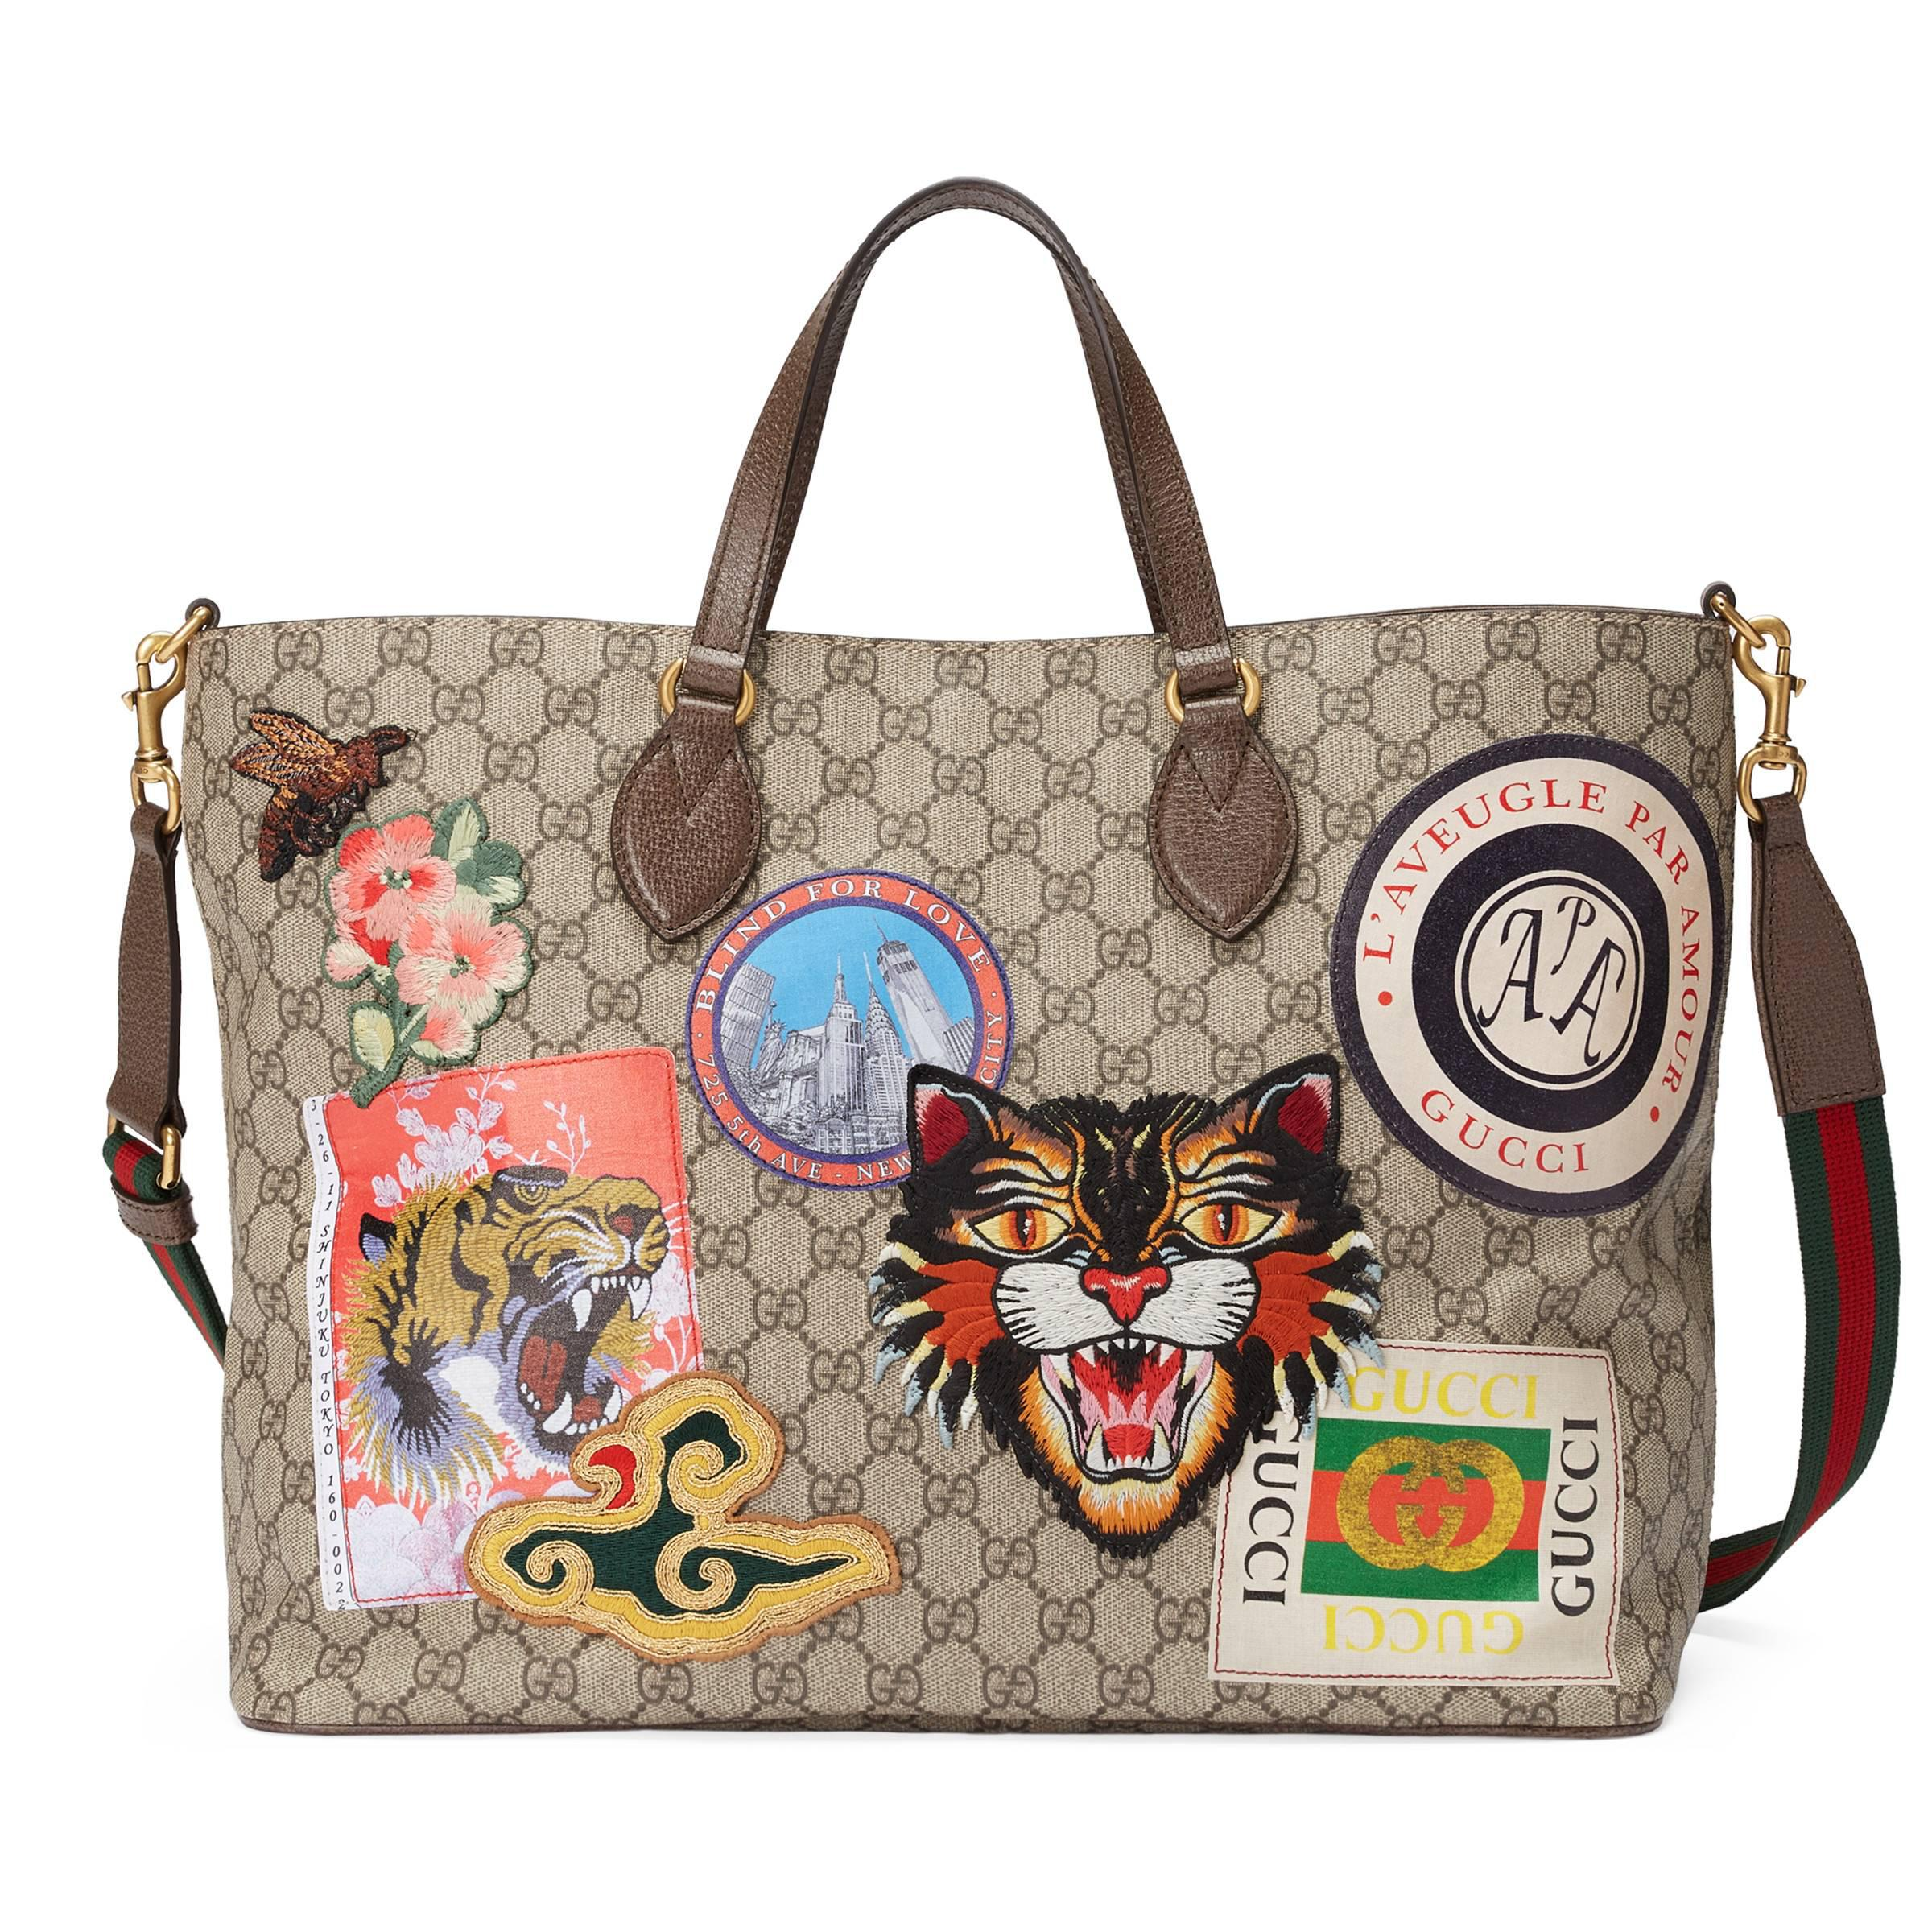 cddc2f973a72 Gucci - Natural Courrier Soft GG Supreme Tote - Lyst. View fullscreen